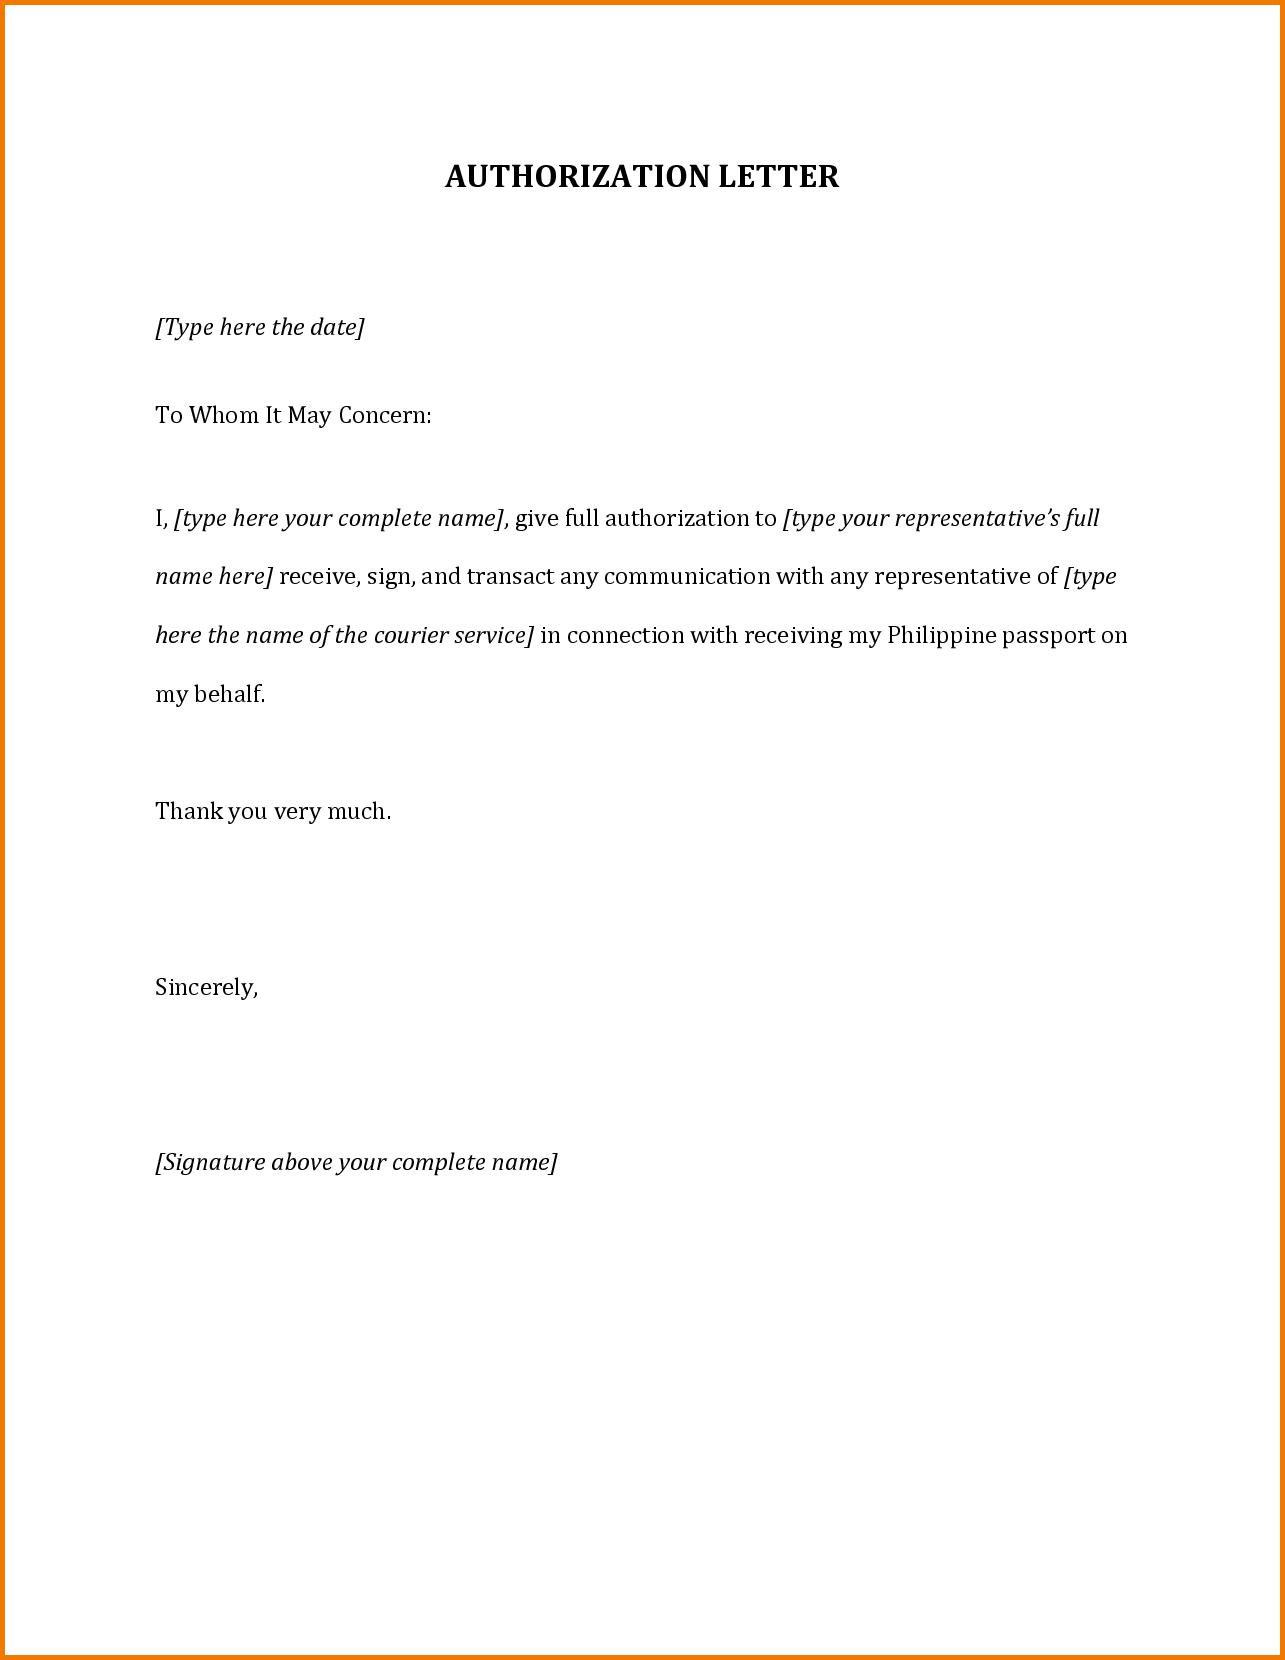 Authorization letter dfa authorisation pdf pick recommendation authorization letter dfa authorisation pdf pick recommendation fandeluxe Choice Image